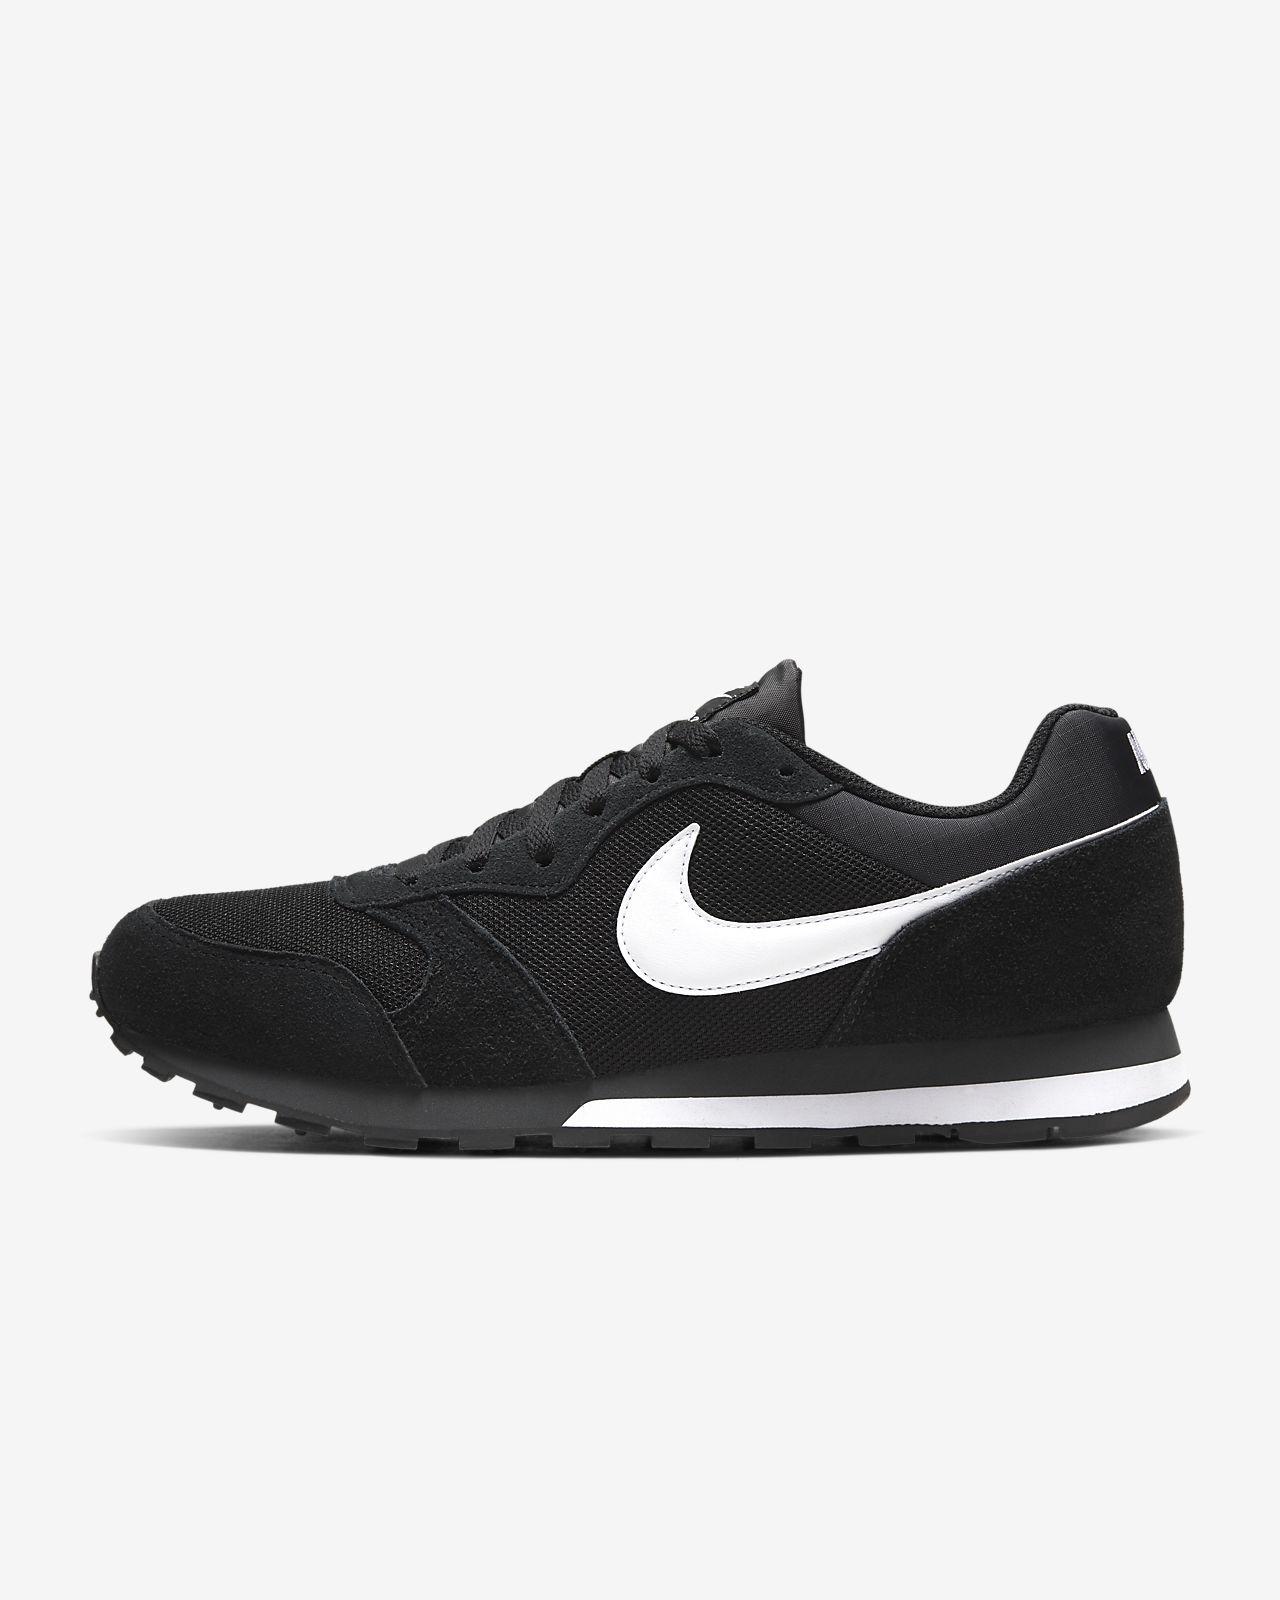 اختصار ضعف فتن Nike Md Runner 2 Gris Hombre Dsvdedommel Com